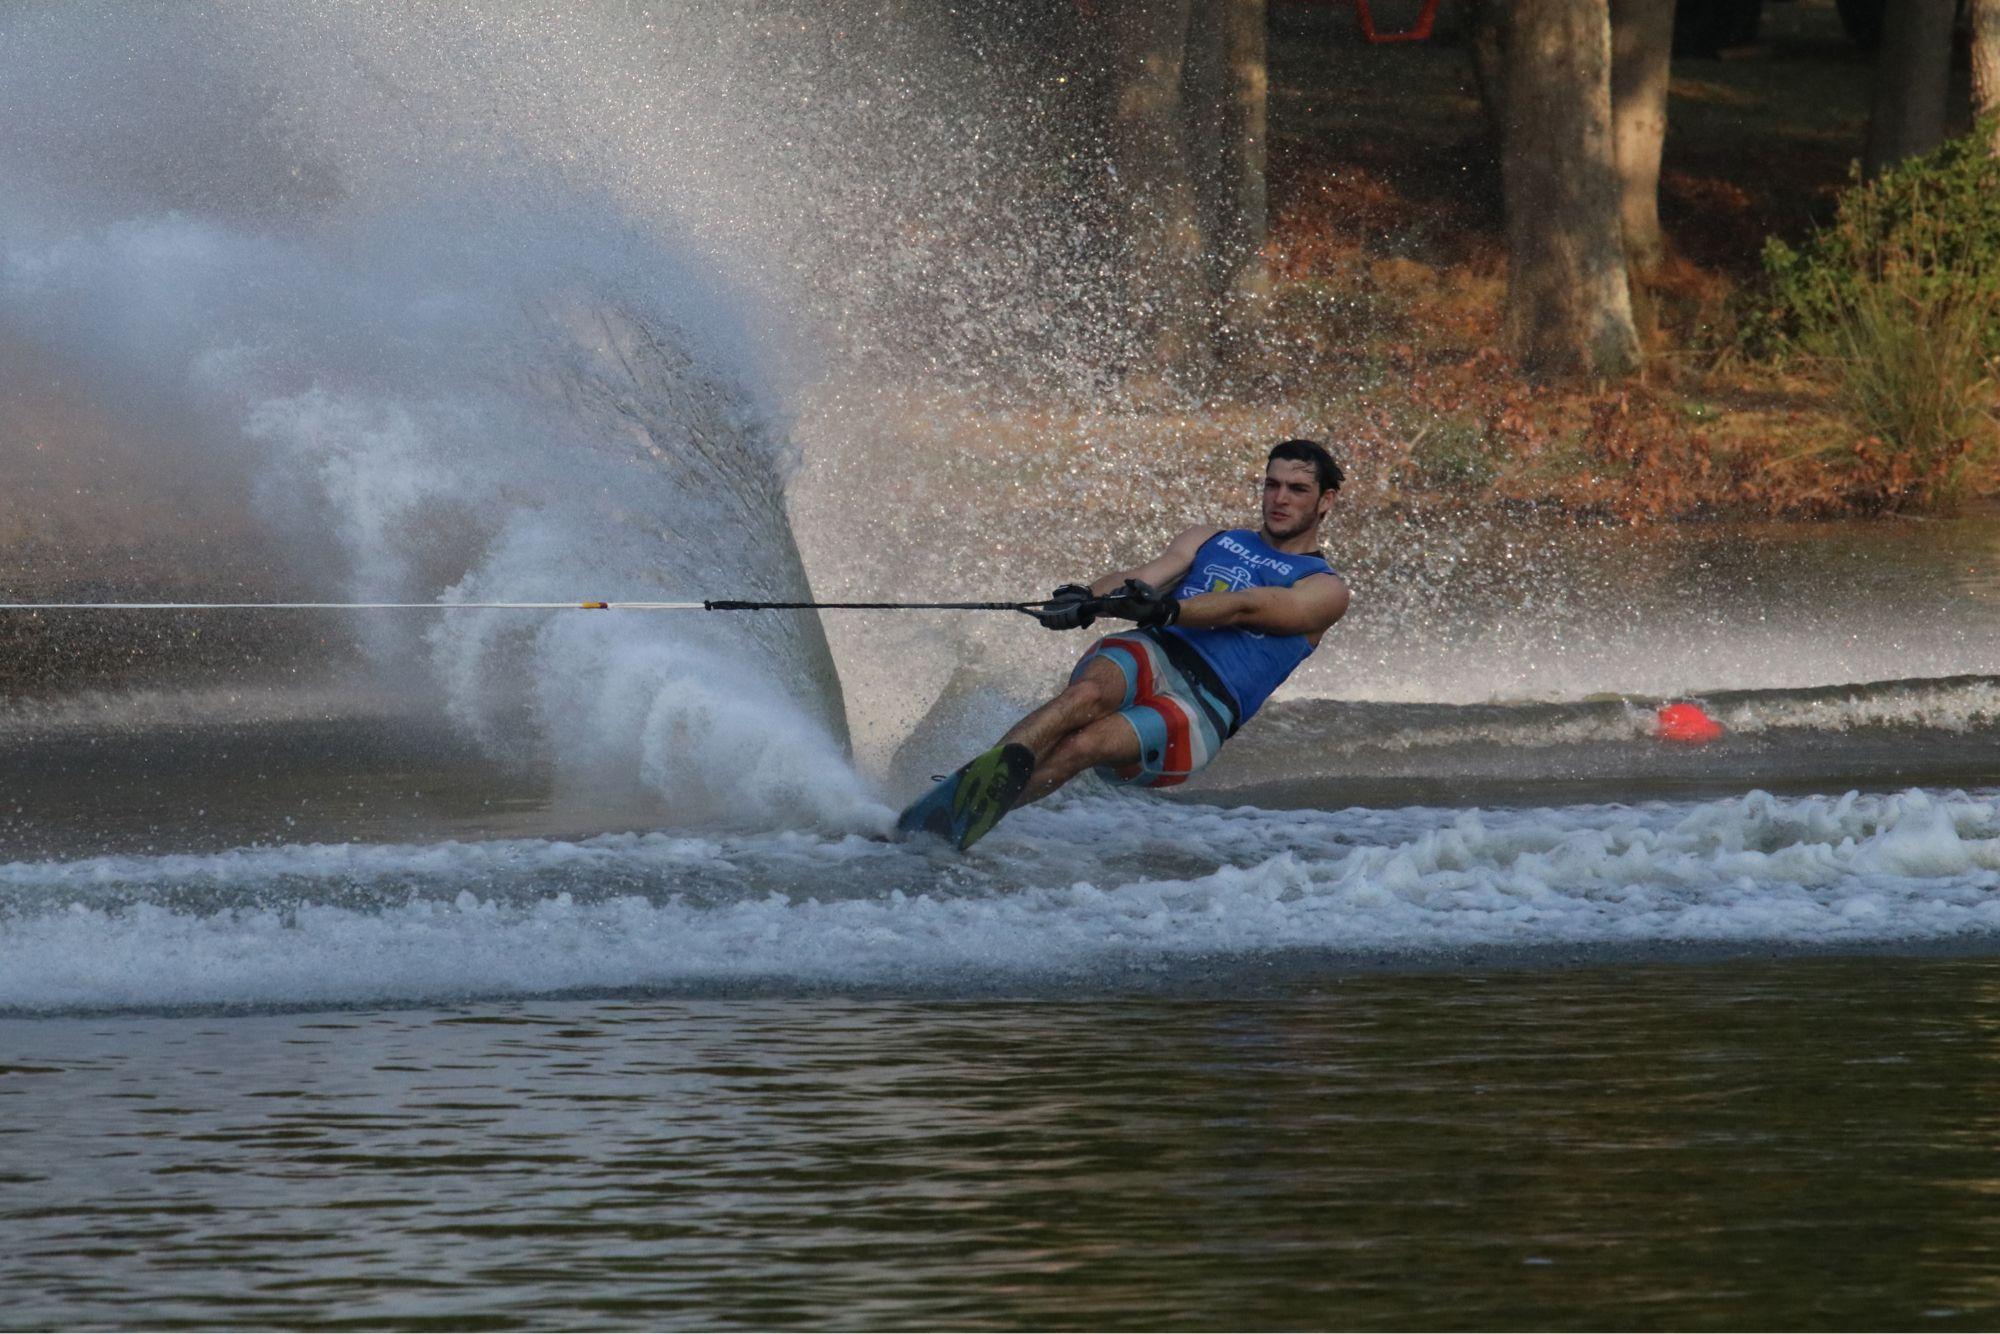 A skier wakeboarding on Lake Virginia.